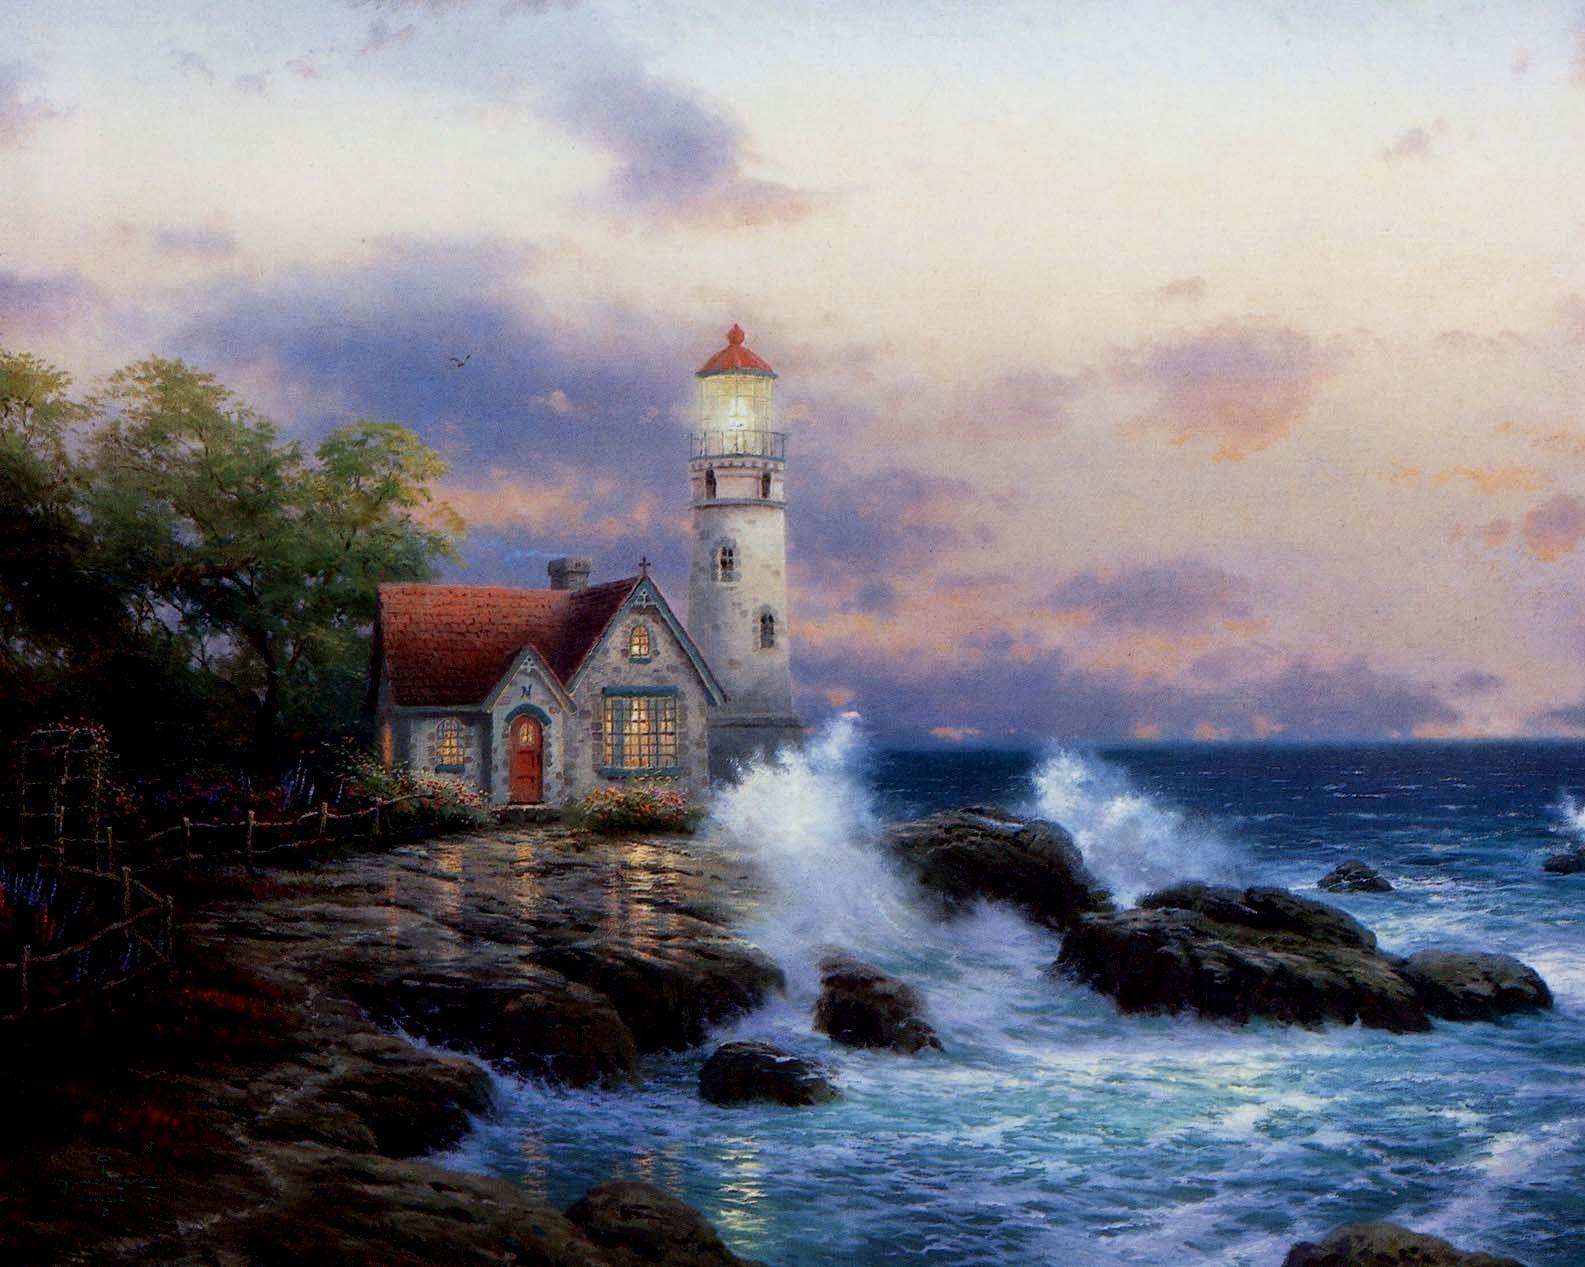 """Beacon of Hope"" by the Painter of Light, Thomas Kincade (January 19, 1958 - April 6, 2012)"